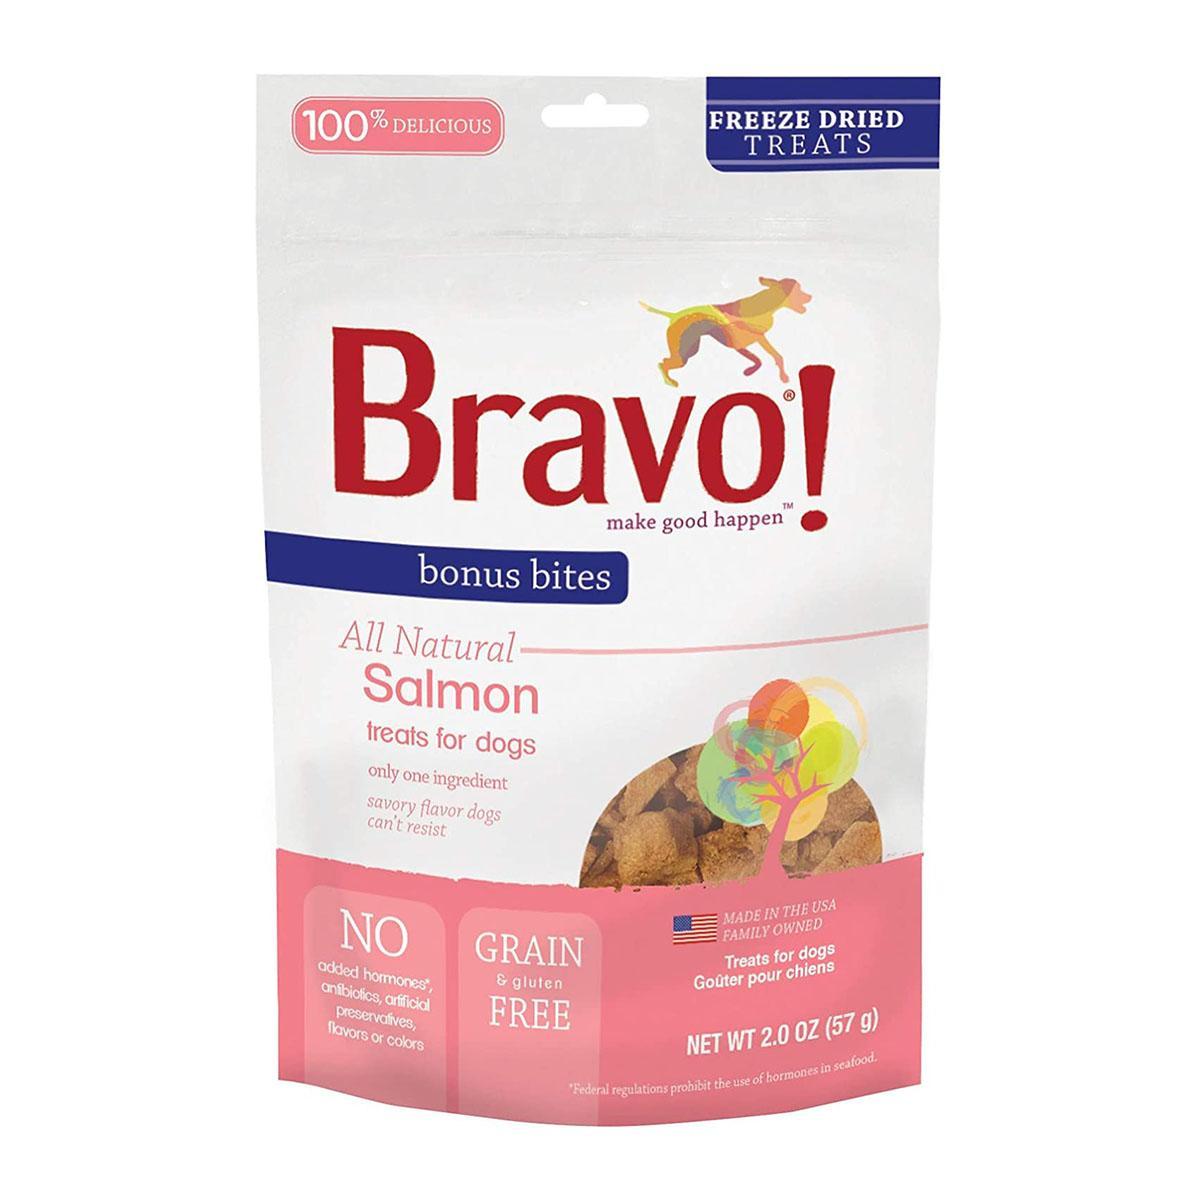 Bravo! Bonus Bites Freeze Dried Dog Treat - Salmon